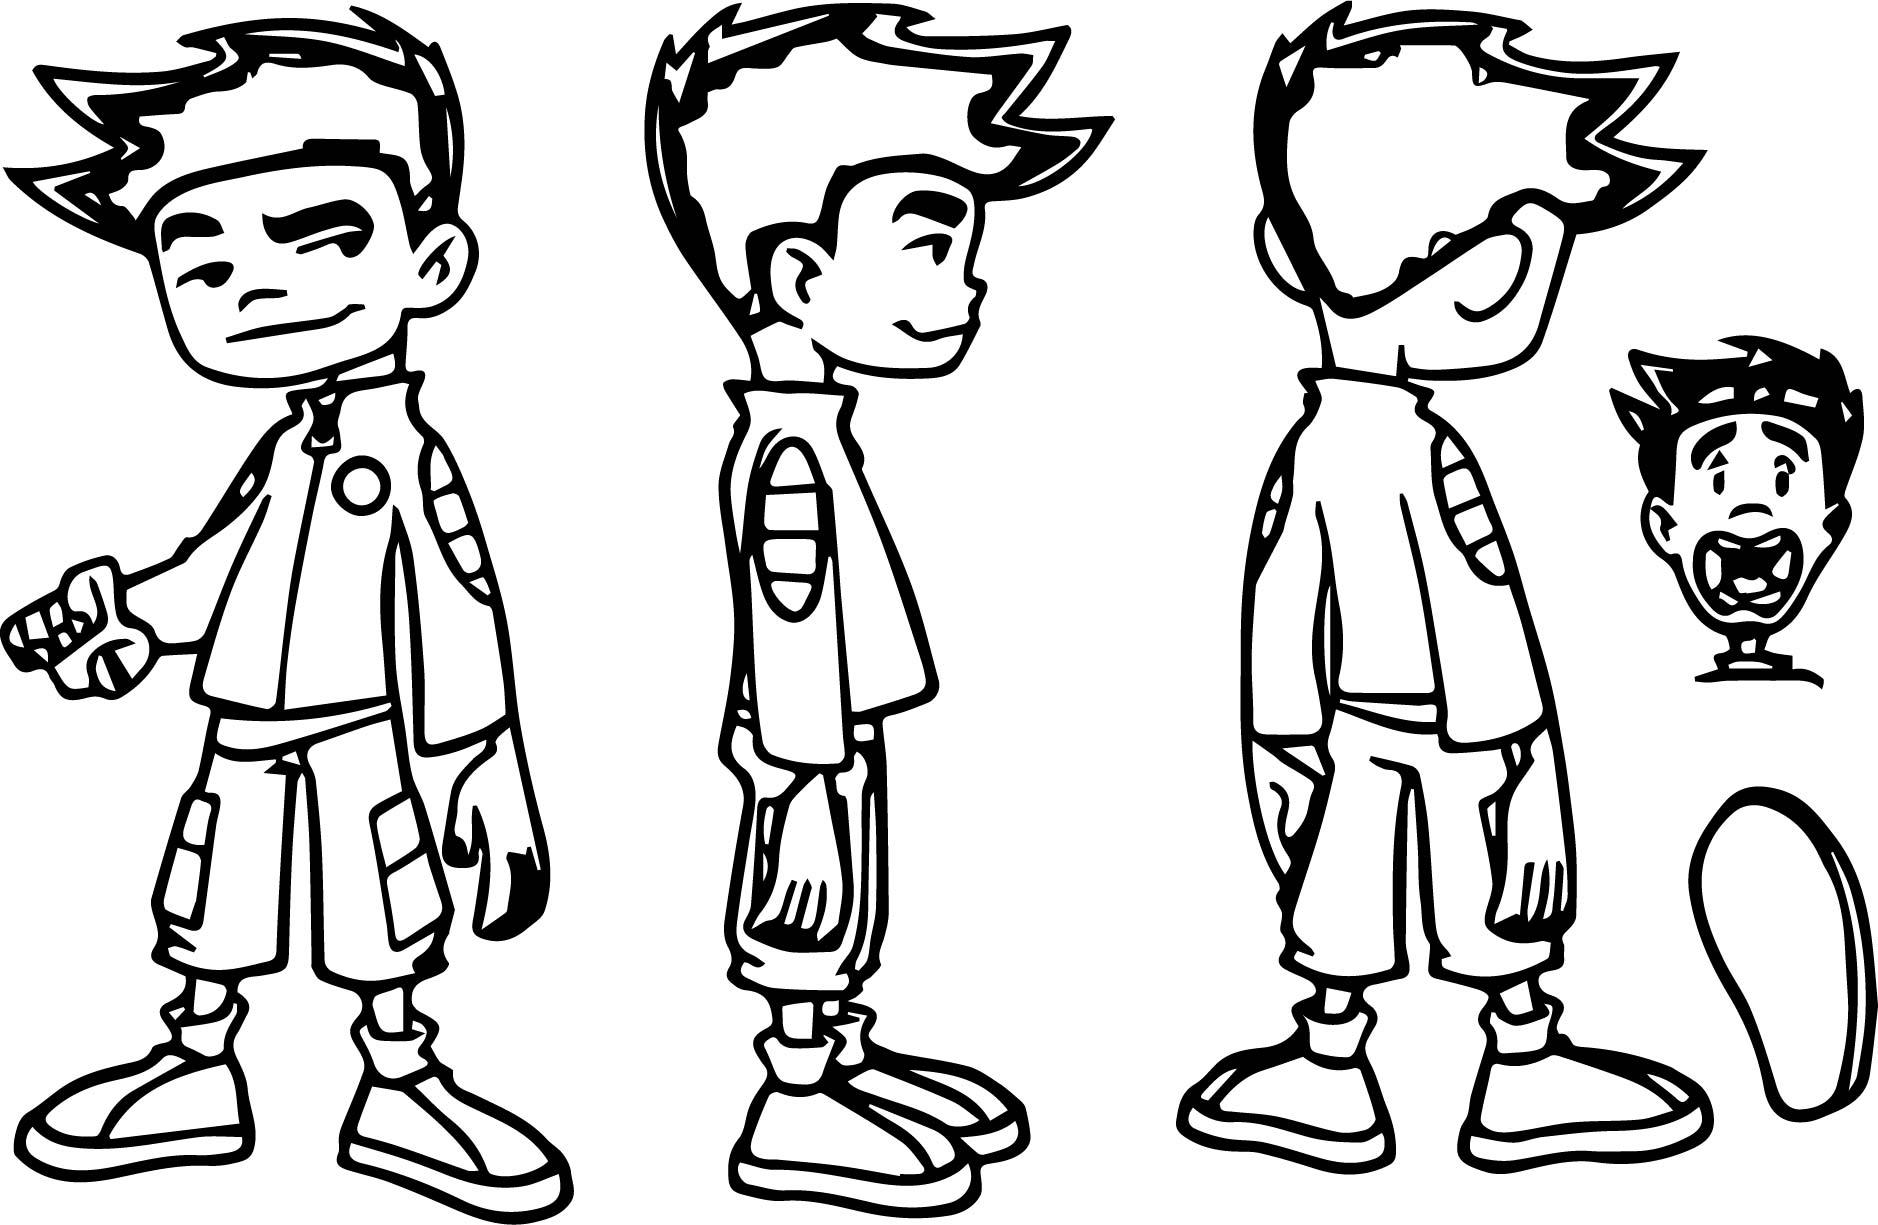 Jake Long Concept Art Coloring Page